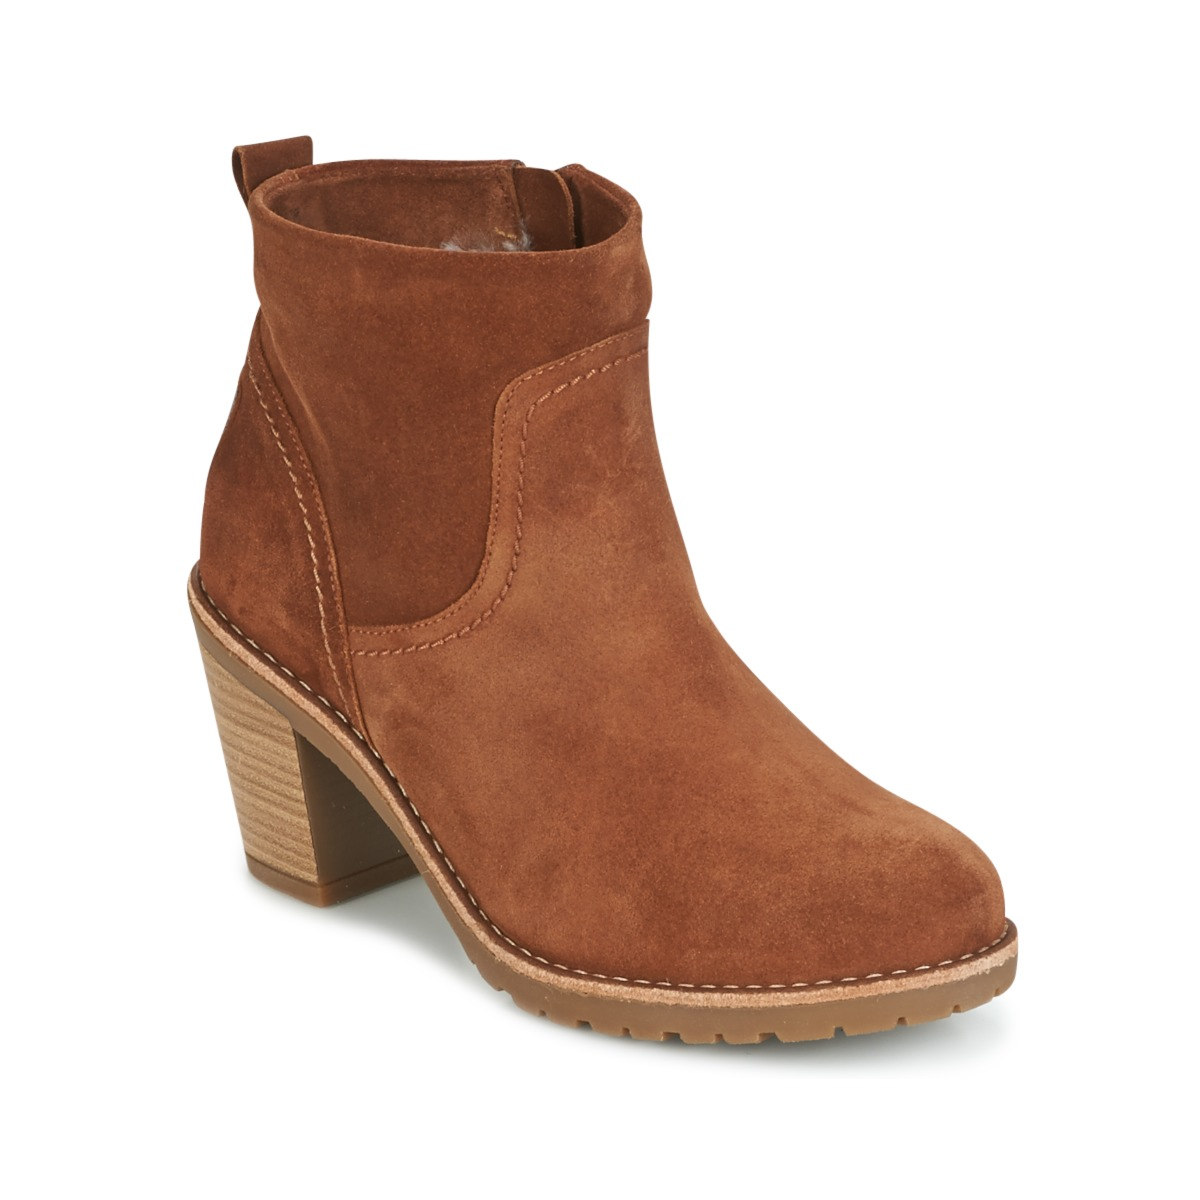 Panama Jack ARLES Braun - Kostenloser Versand bei Spartoode ! - Schuhe Low Boots Damen 122,50 €